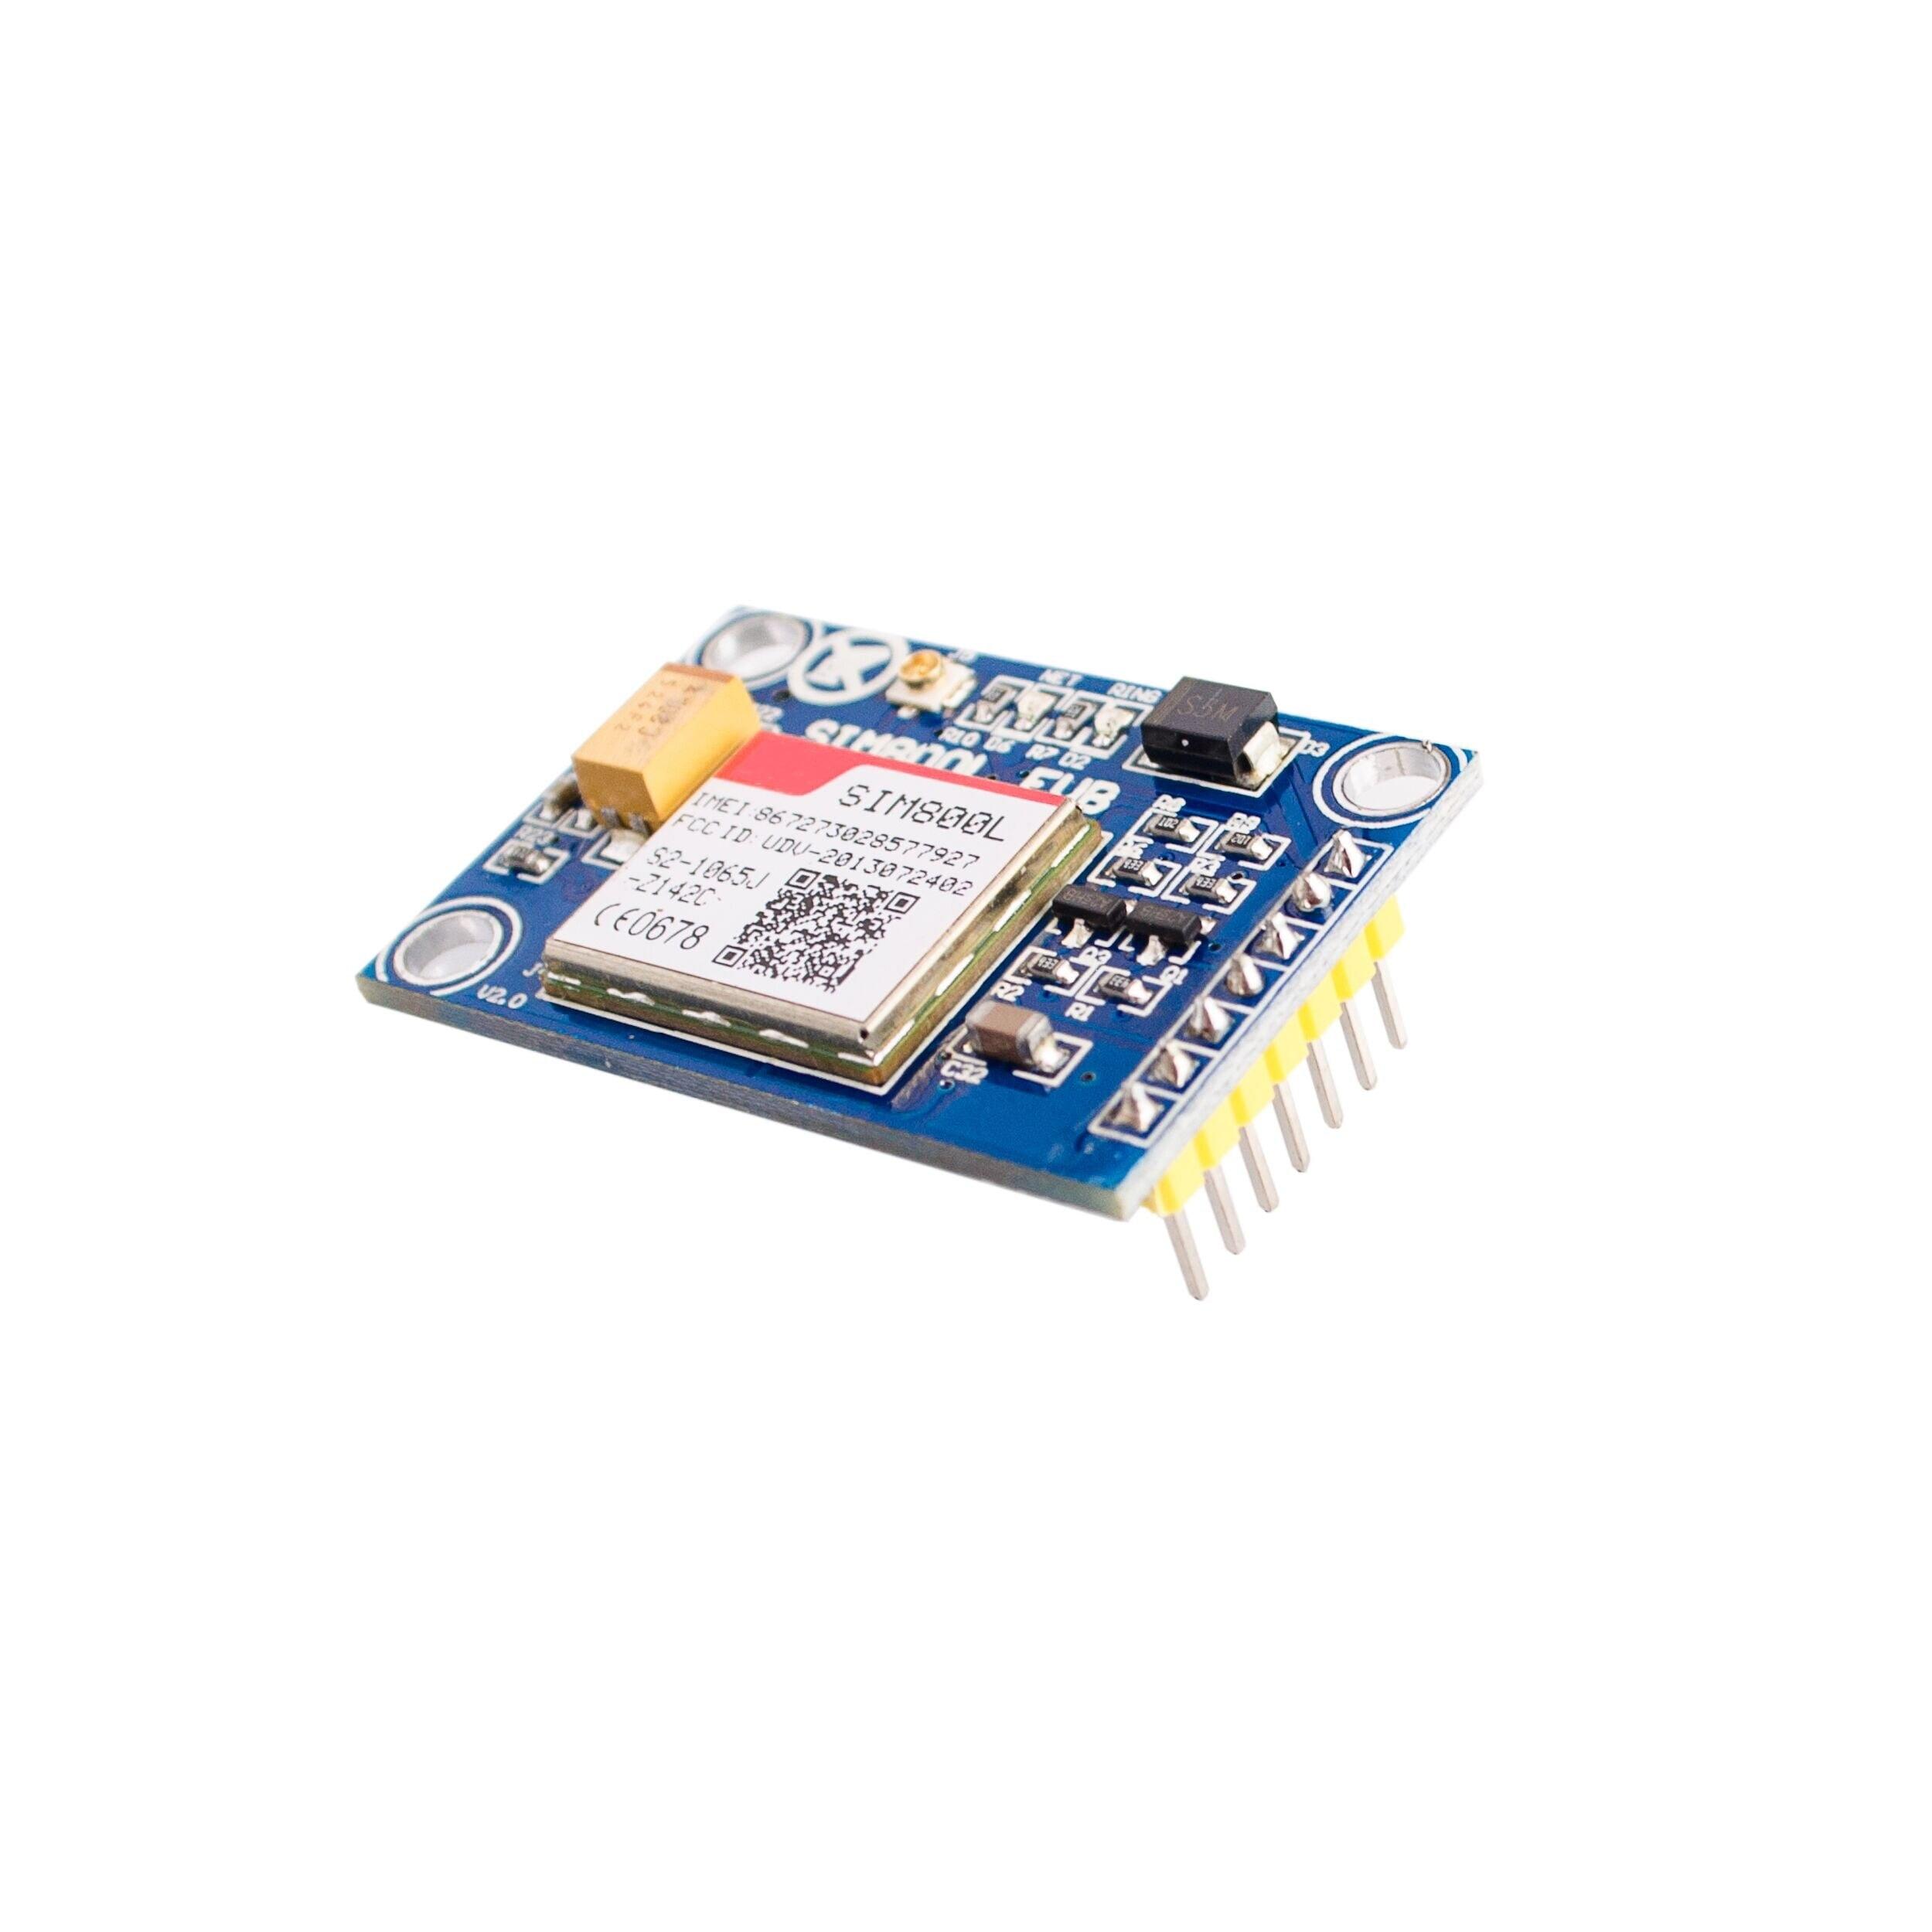 SIM800L V2.0 5V Wireless GSM GPRS Module Quad-Band W/Antenna